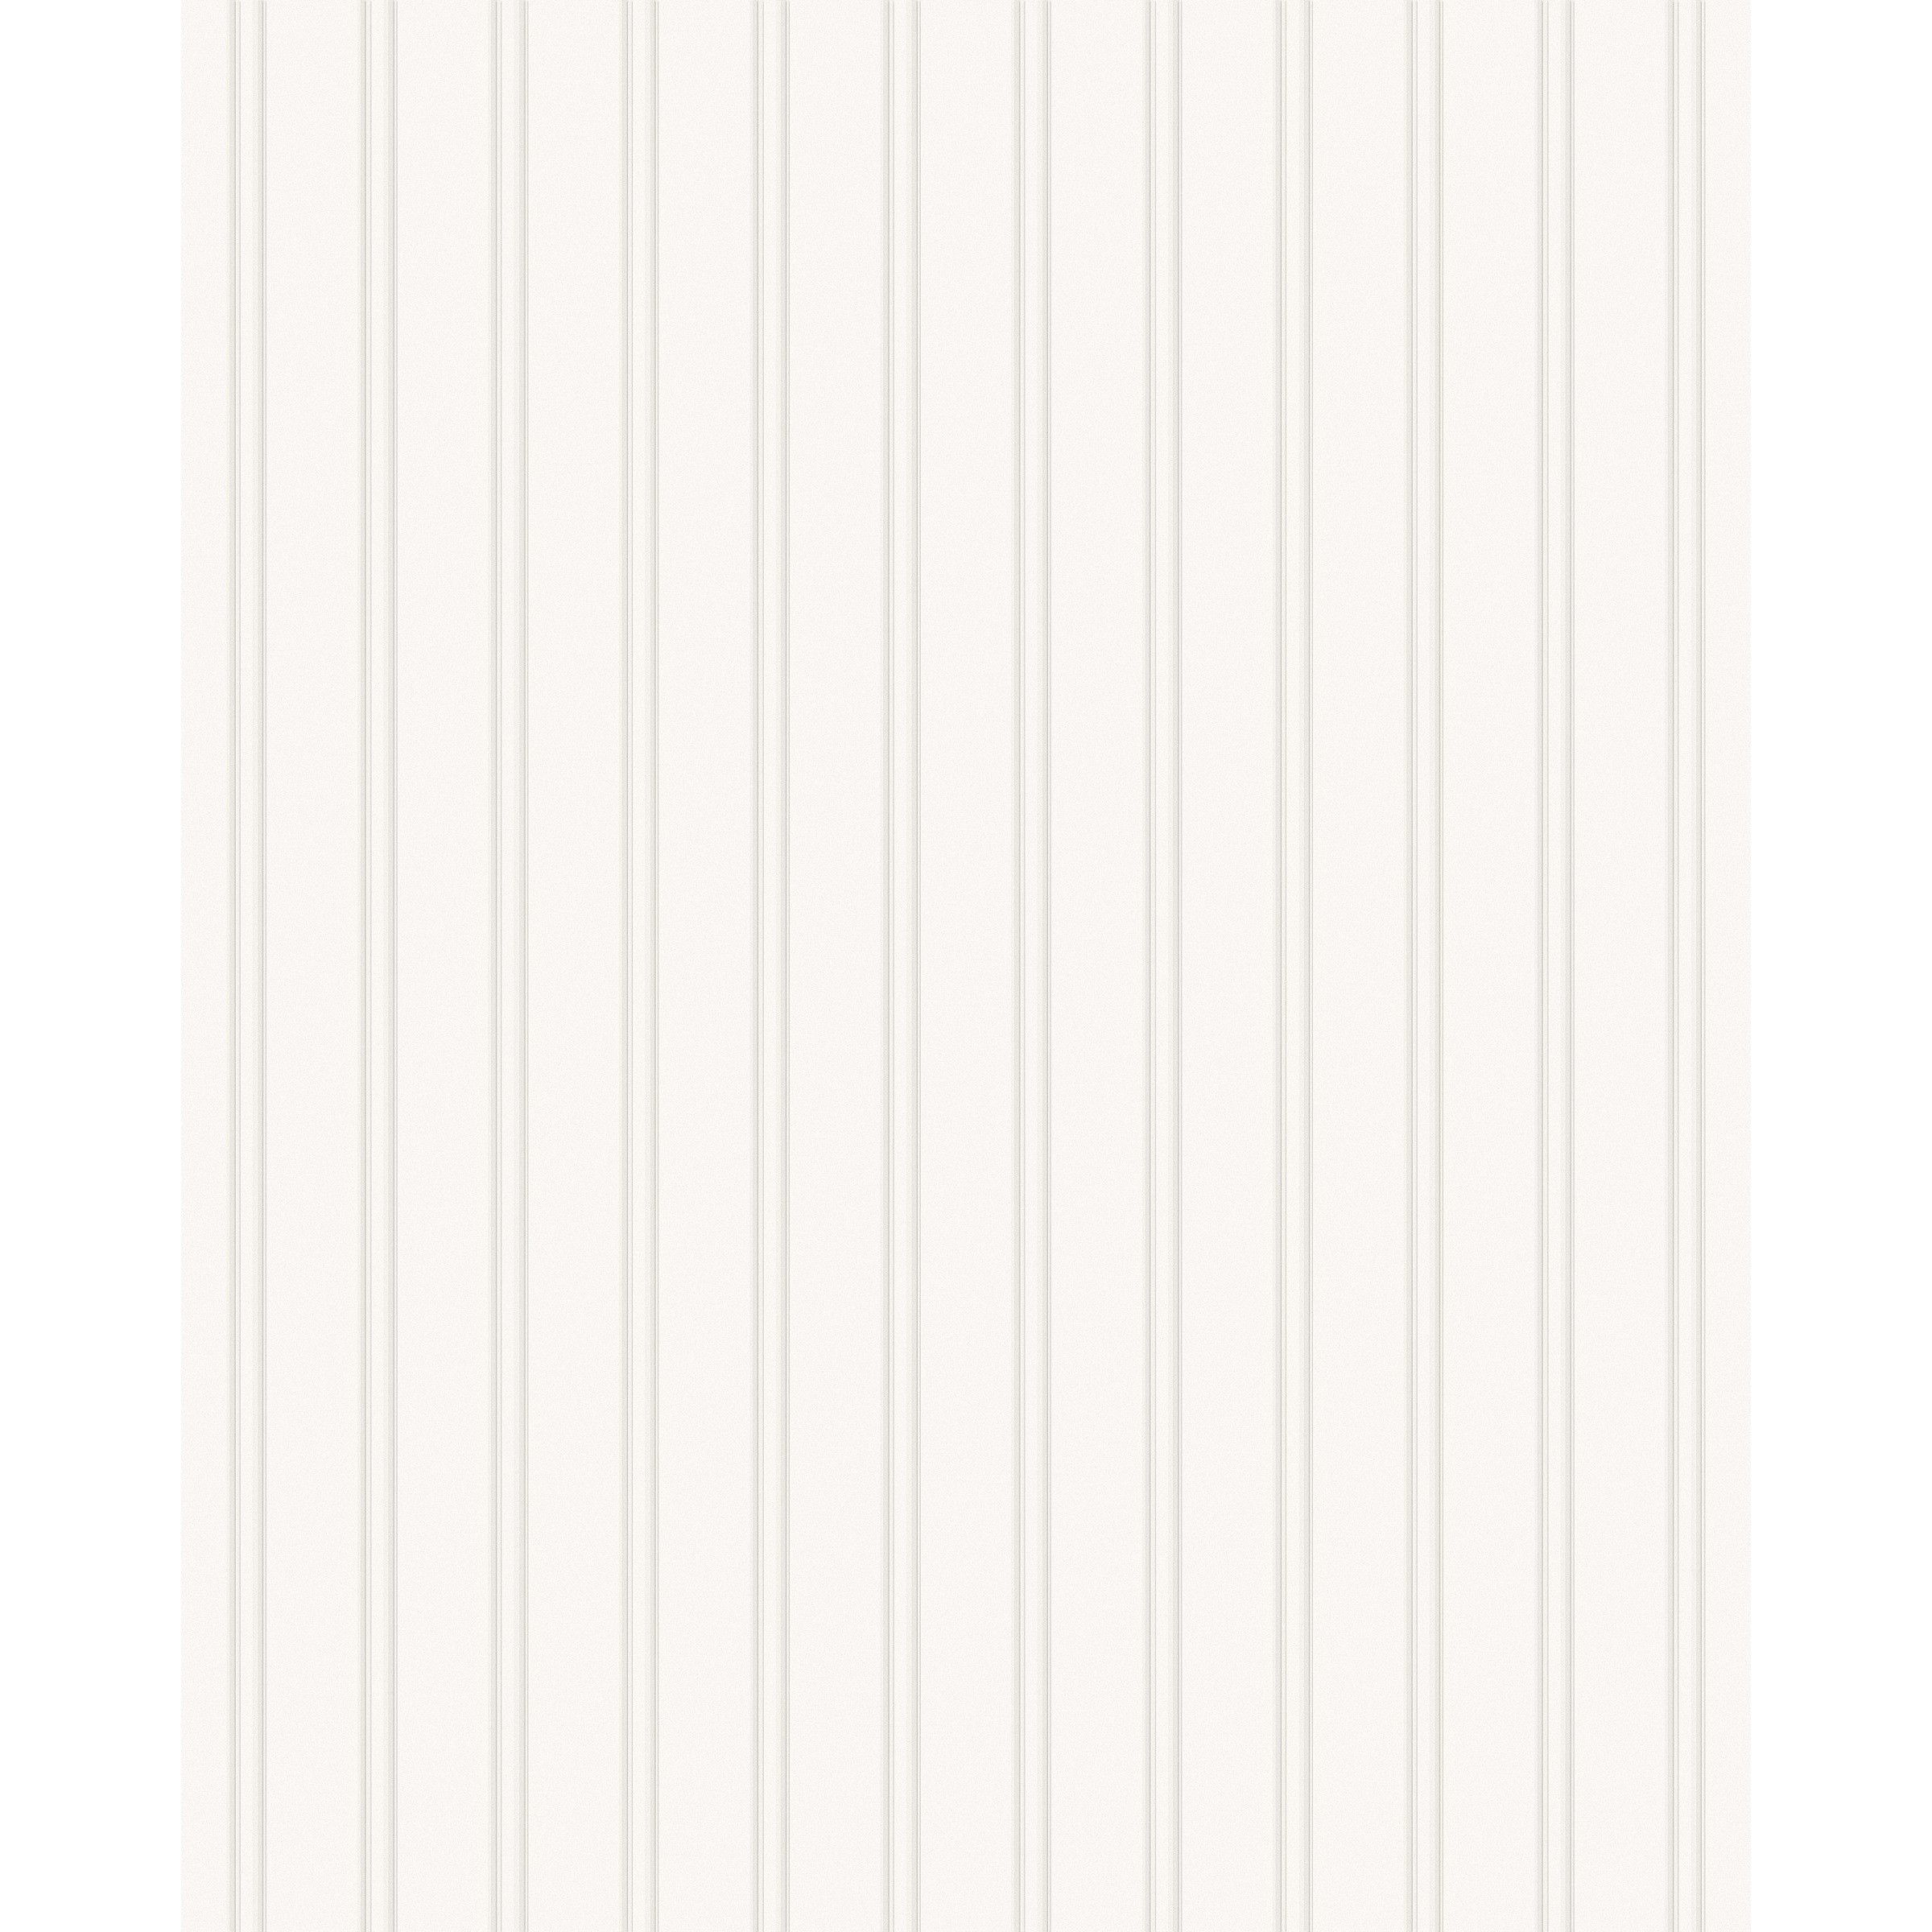 Beadboard Paintable Wallpaper Beadboard wallpaper